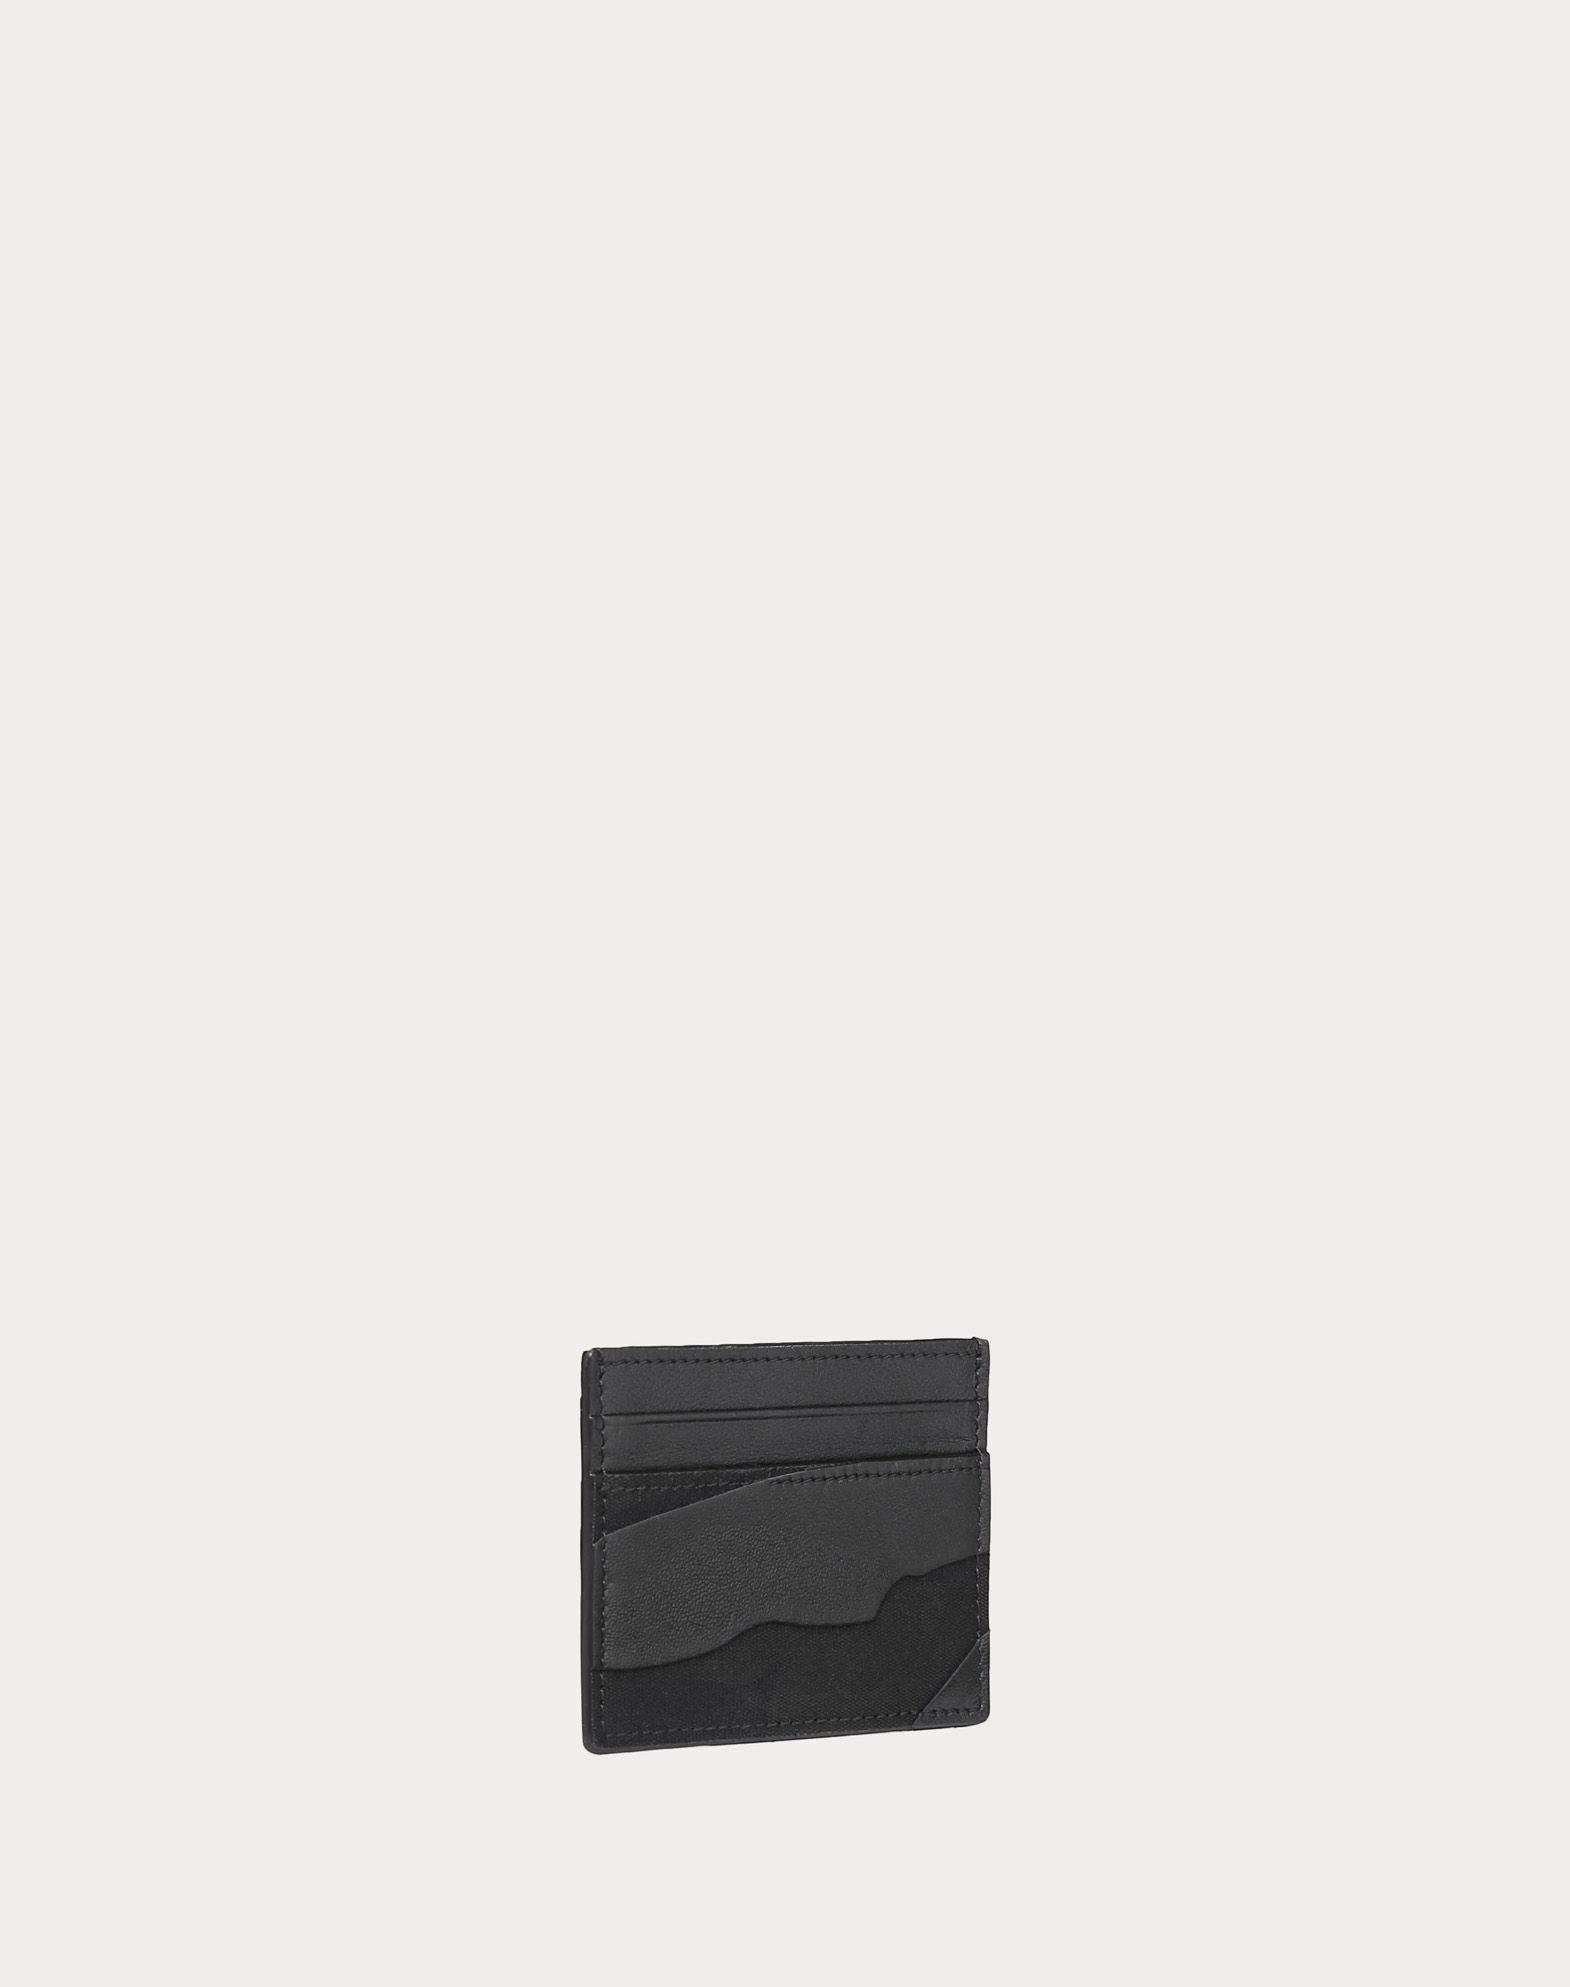 VALENTINO GARAVANI UOMO Camouflage Noir Cardholder COIN PURSES & CARD CASES U r